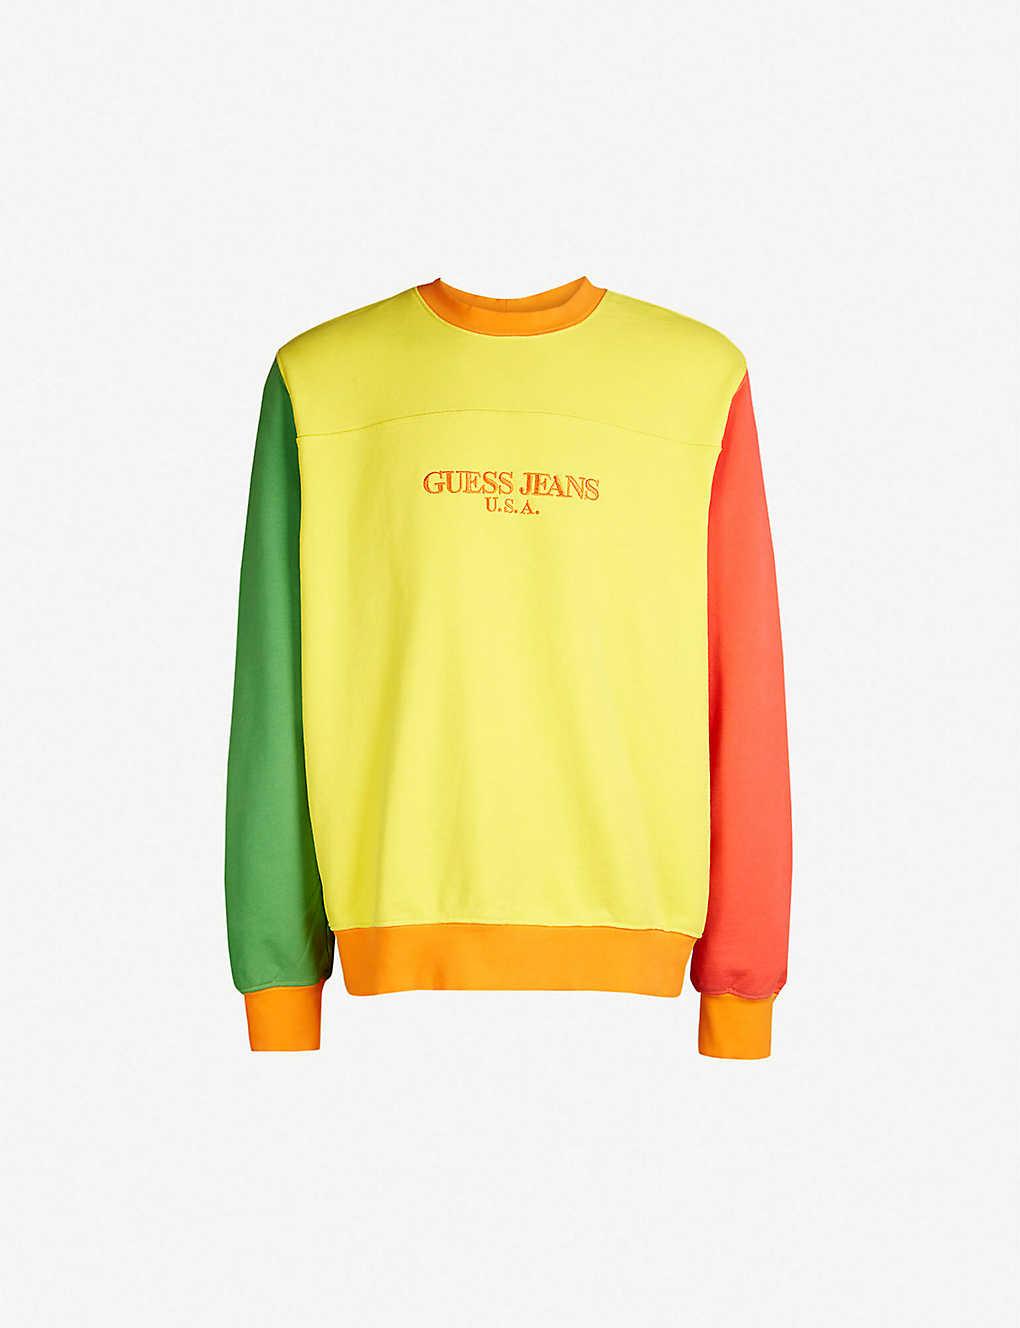 4528e3c9 GUESS JEANS USA - Farmers Market logo-embroidered cotton-jersey sweatshirt    Selfridges.com